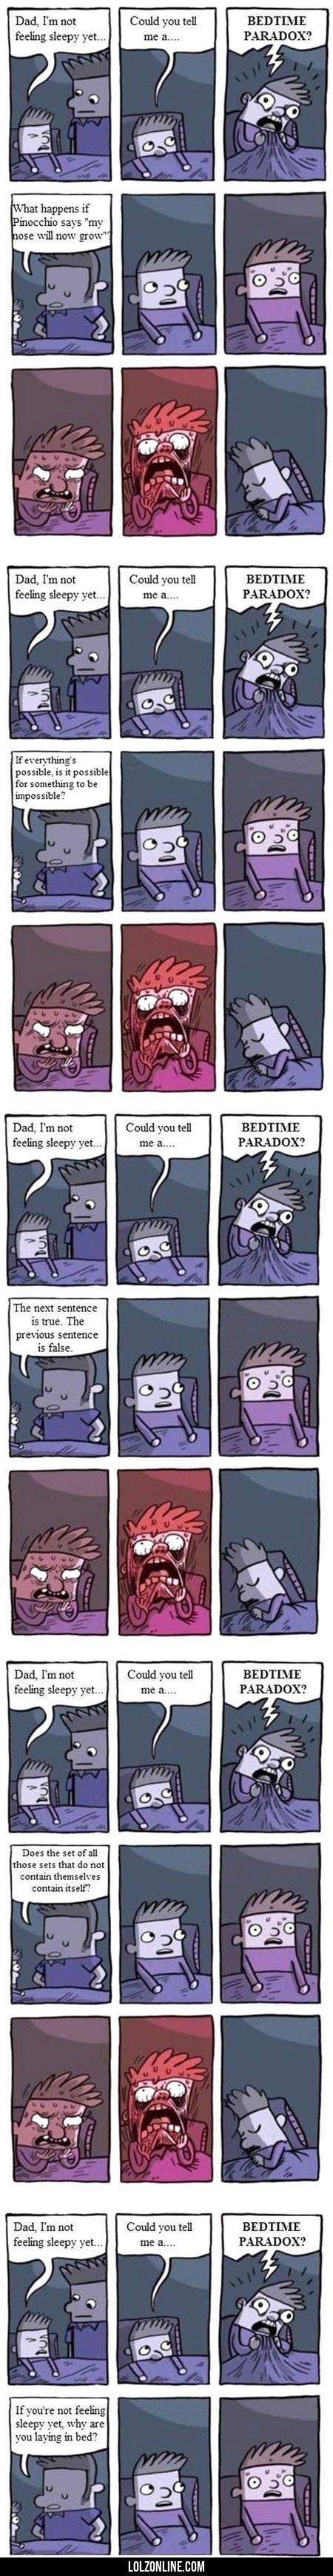 Dad, I'm Not Feeling Sleepy Yet...#funny #lol #lolzonline